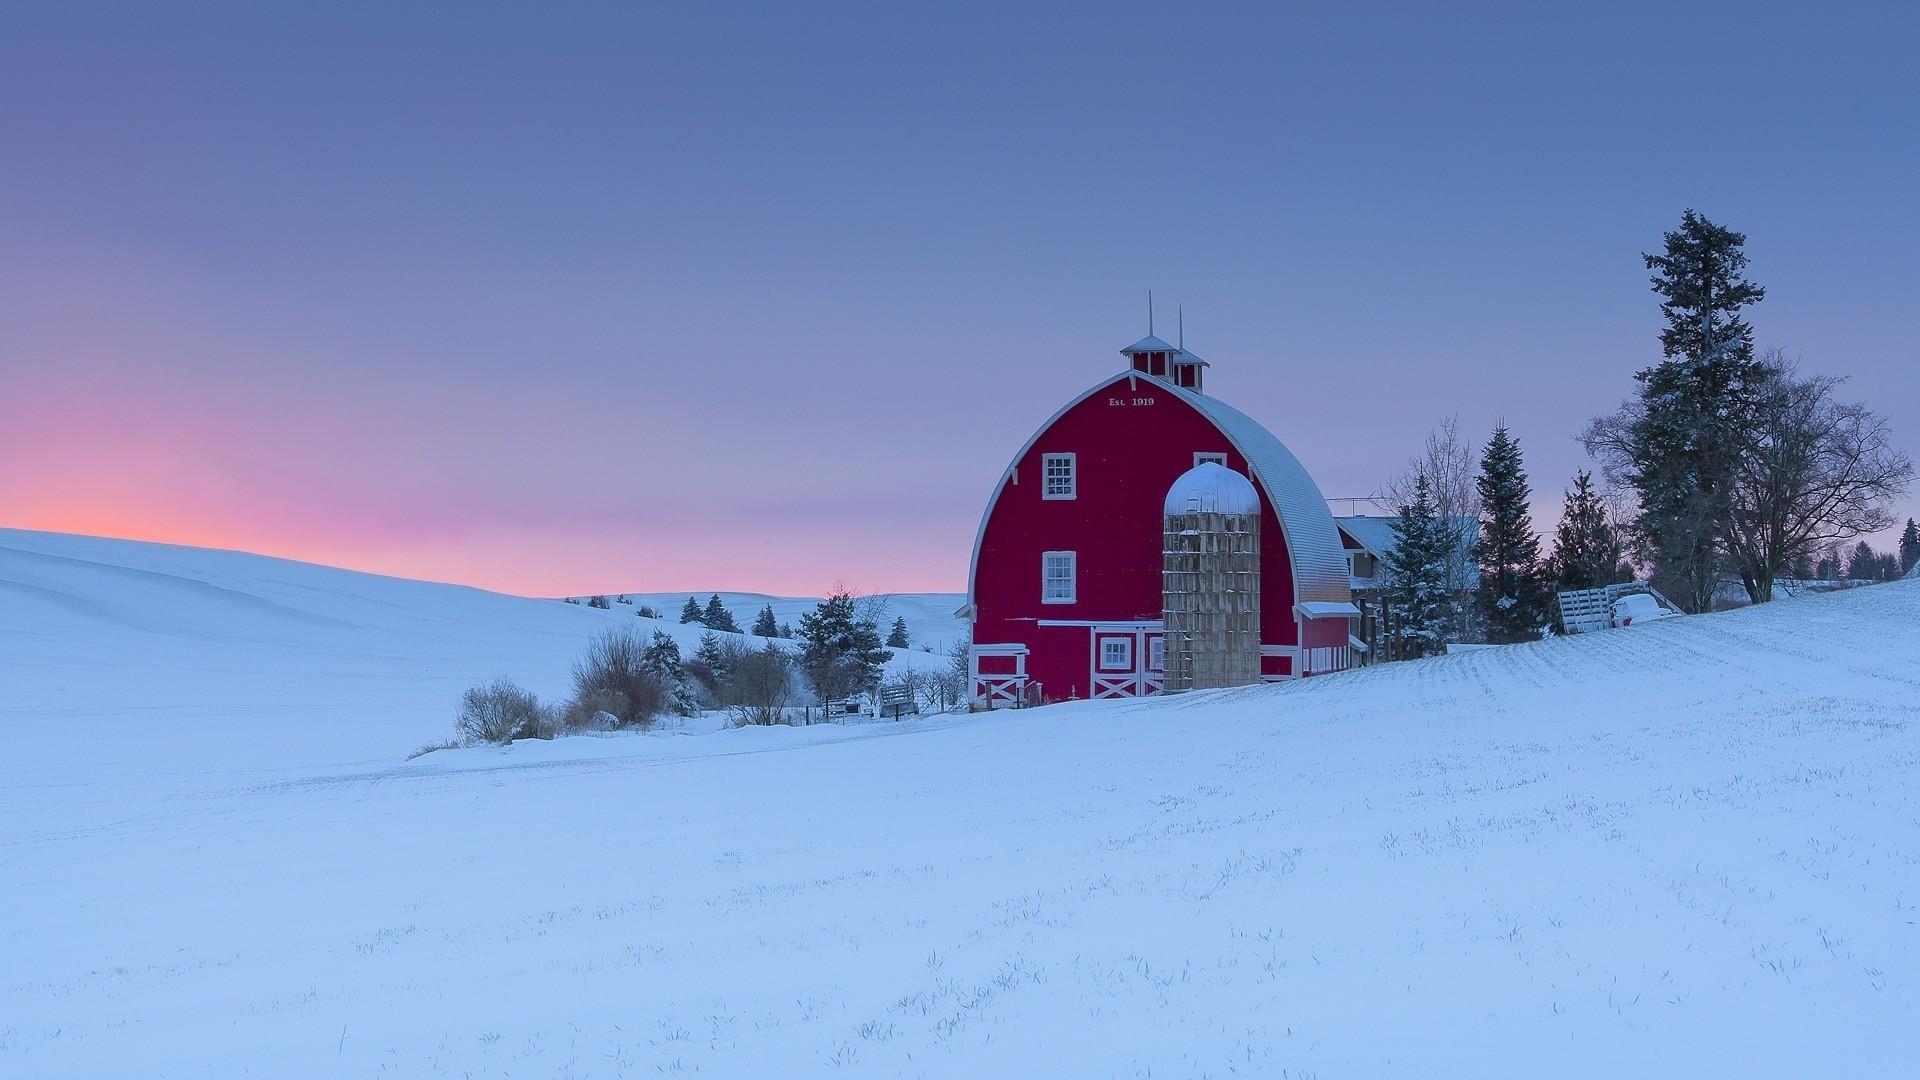 Winter Farm Wallpaper 65 Images